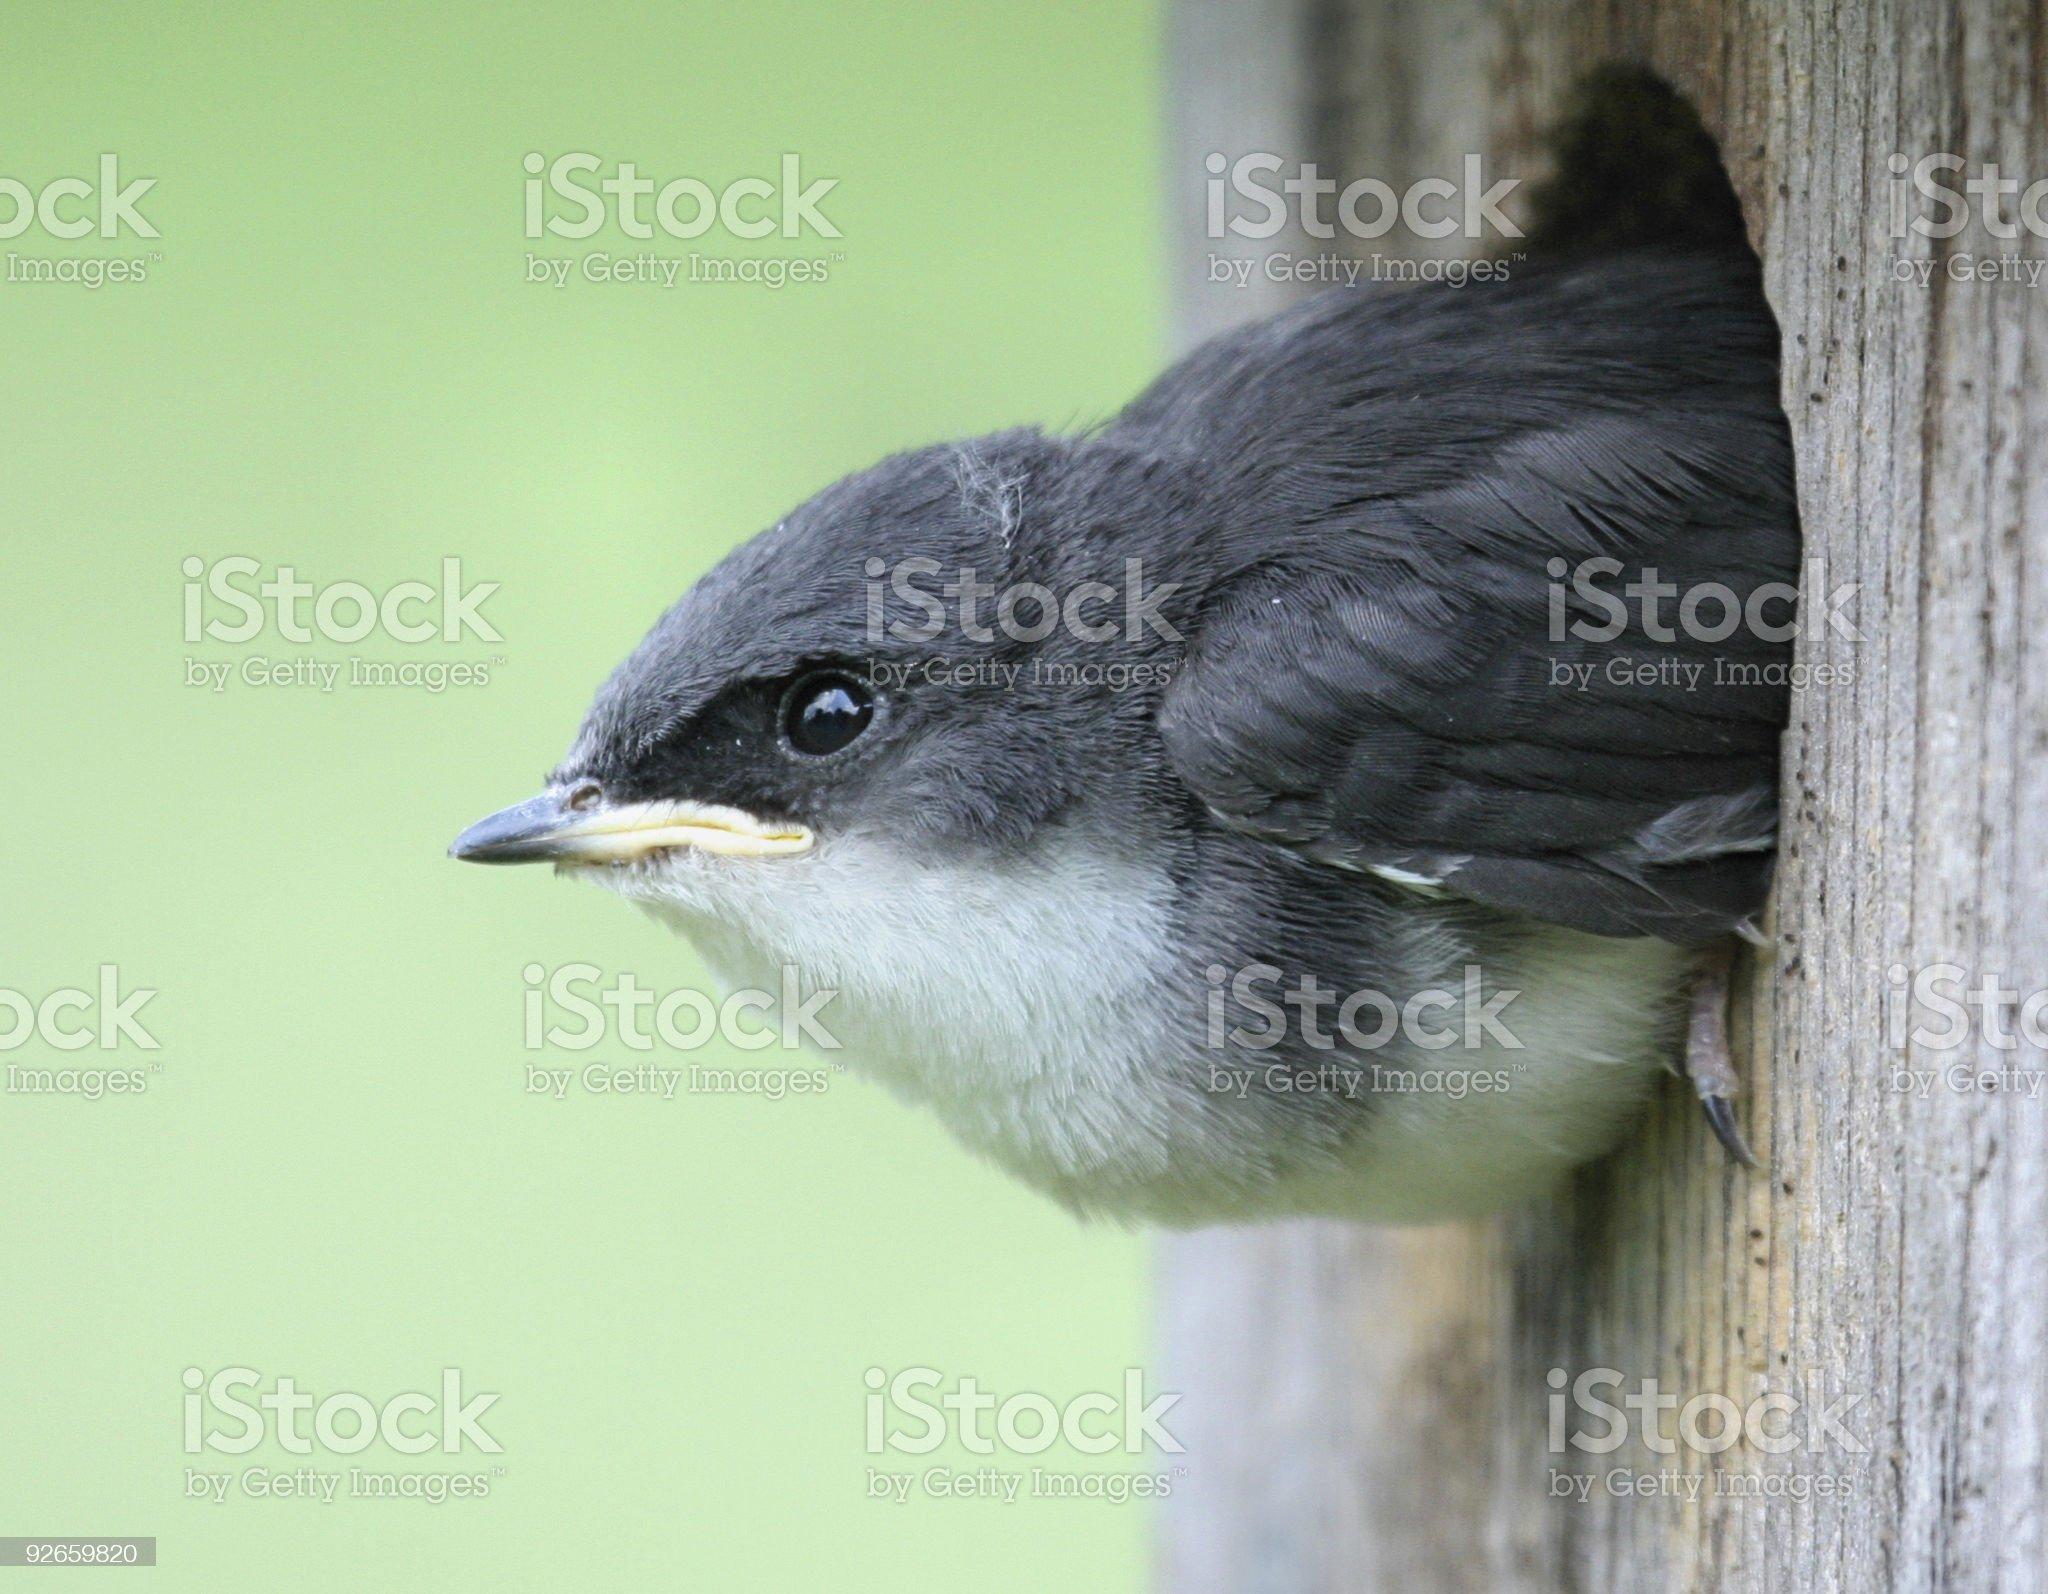 Baby Tree Swallow Ready to Take Flight royalty-free stock photo